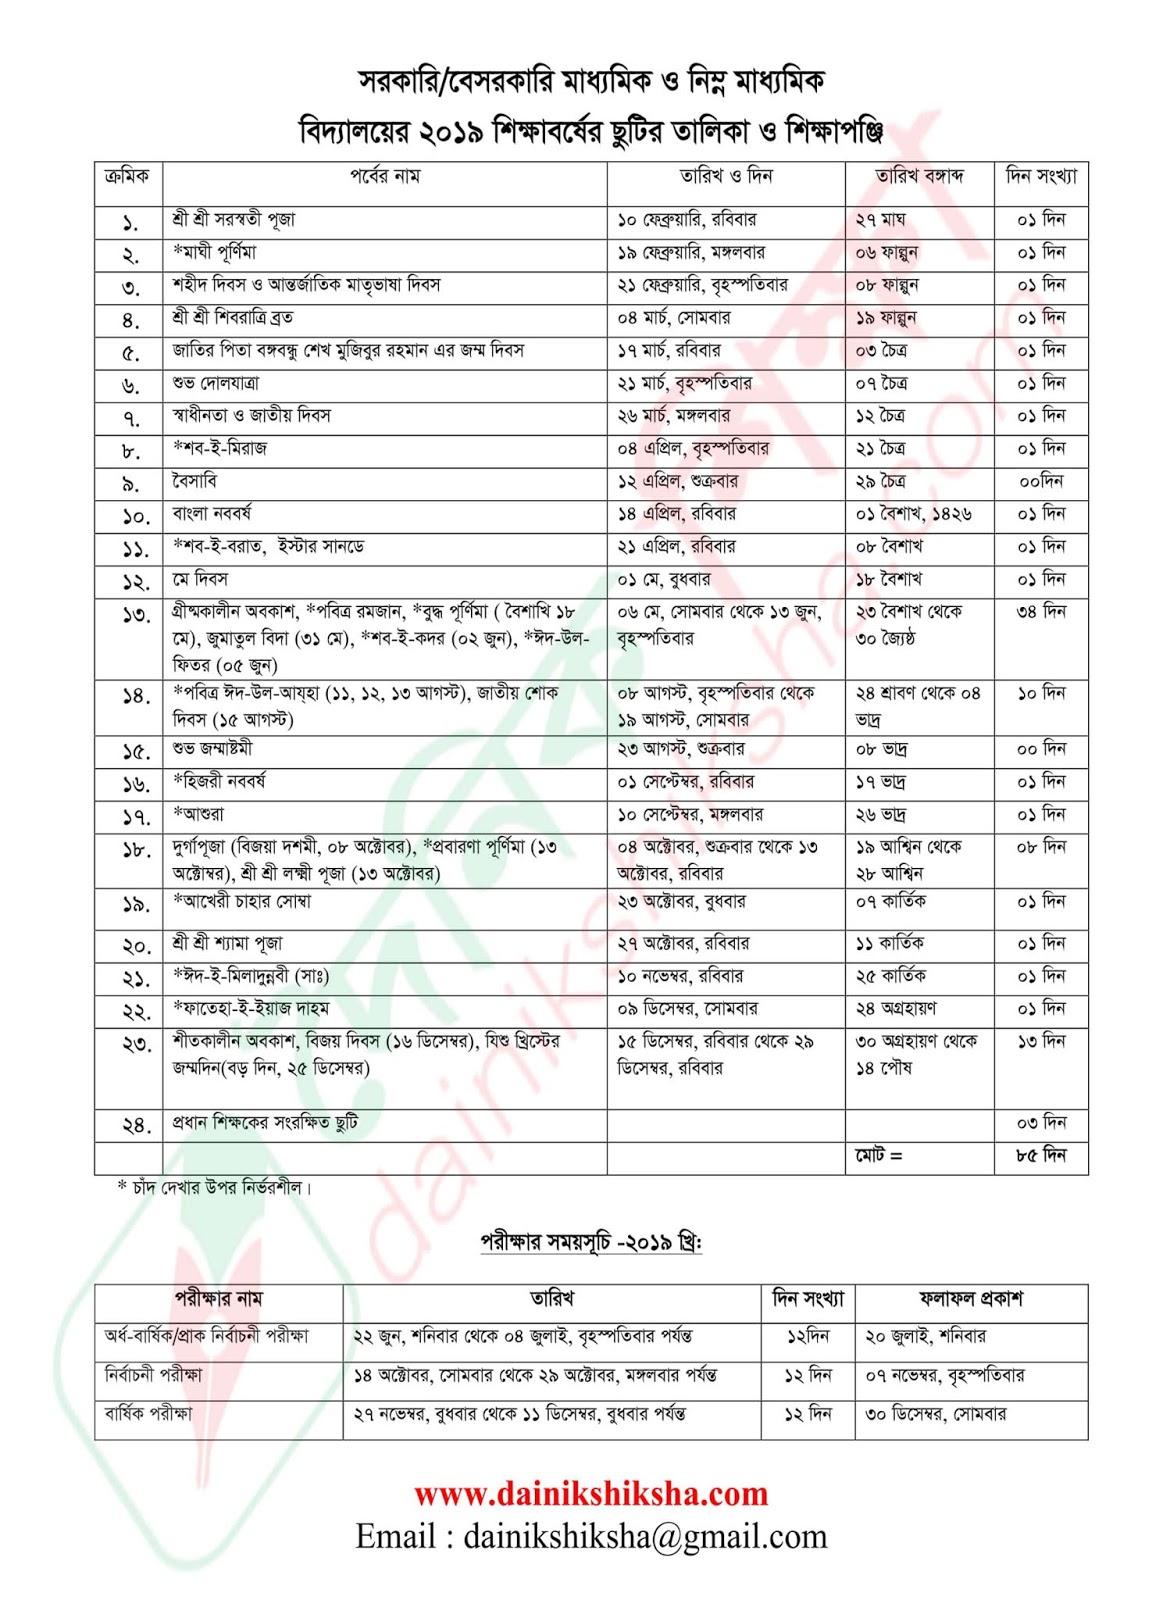 Government School Holidays List 2019 - School Style